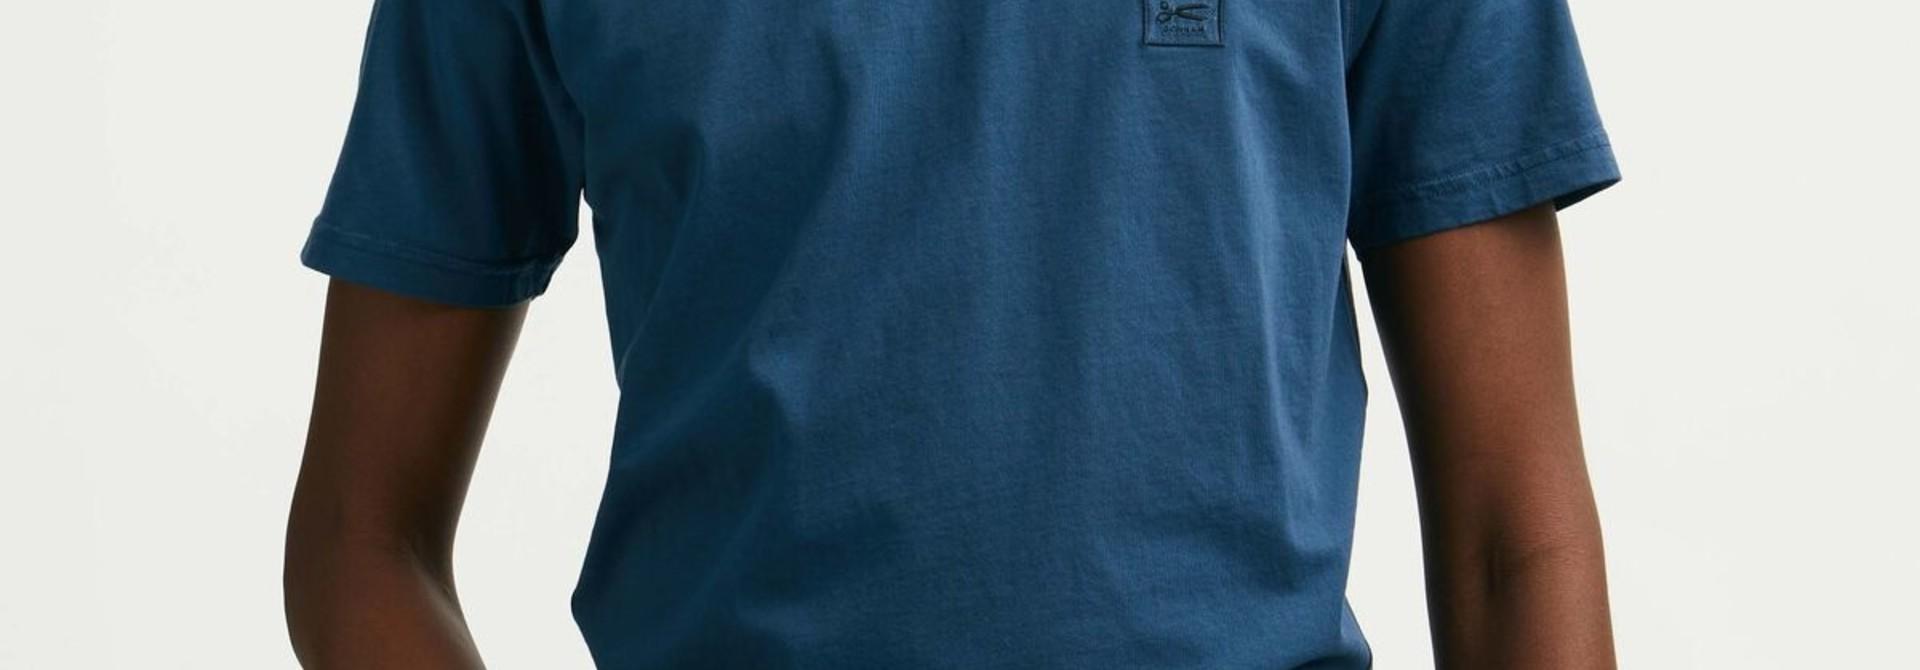 Denham applique Blue wing Teal